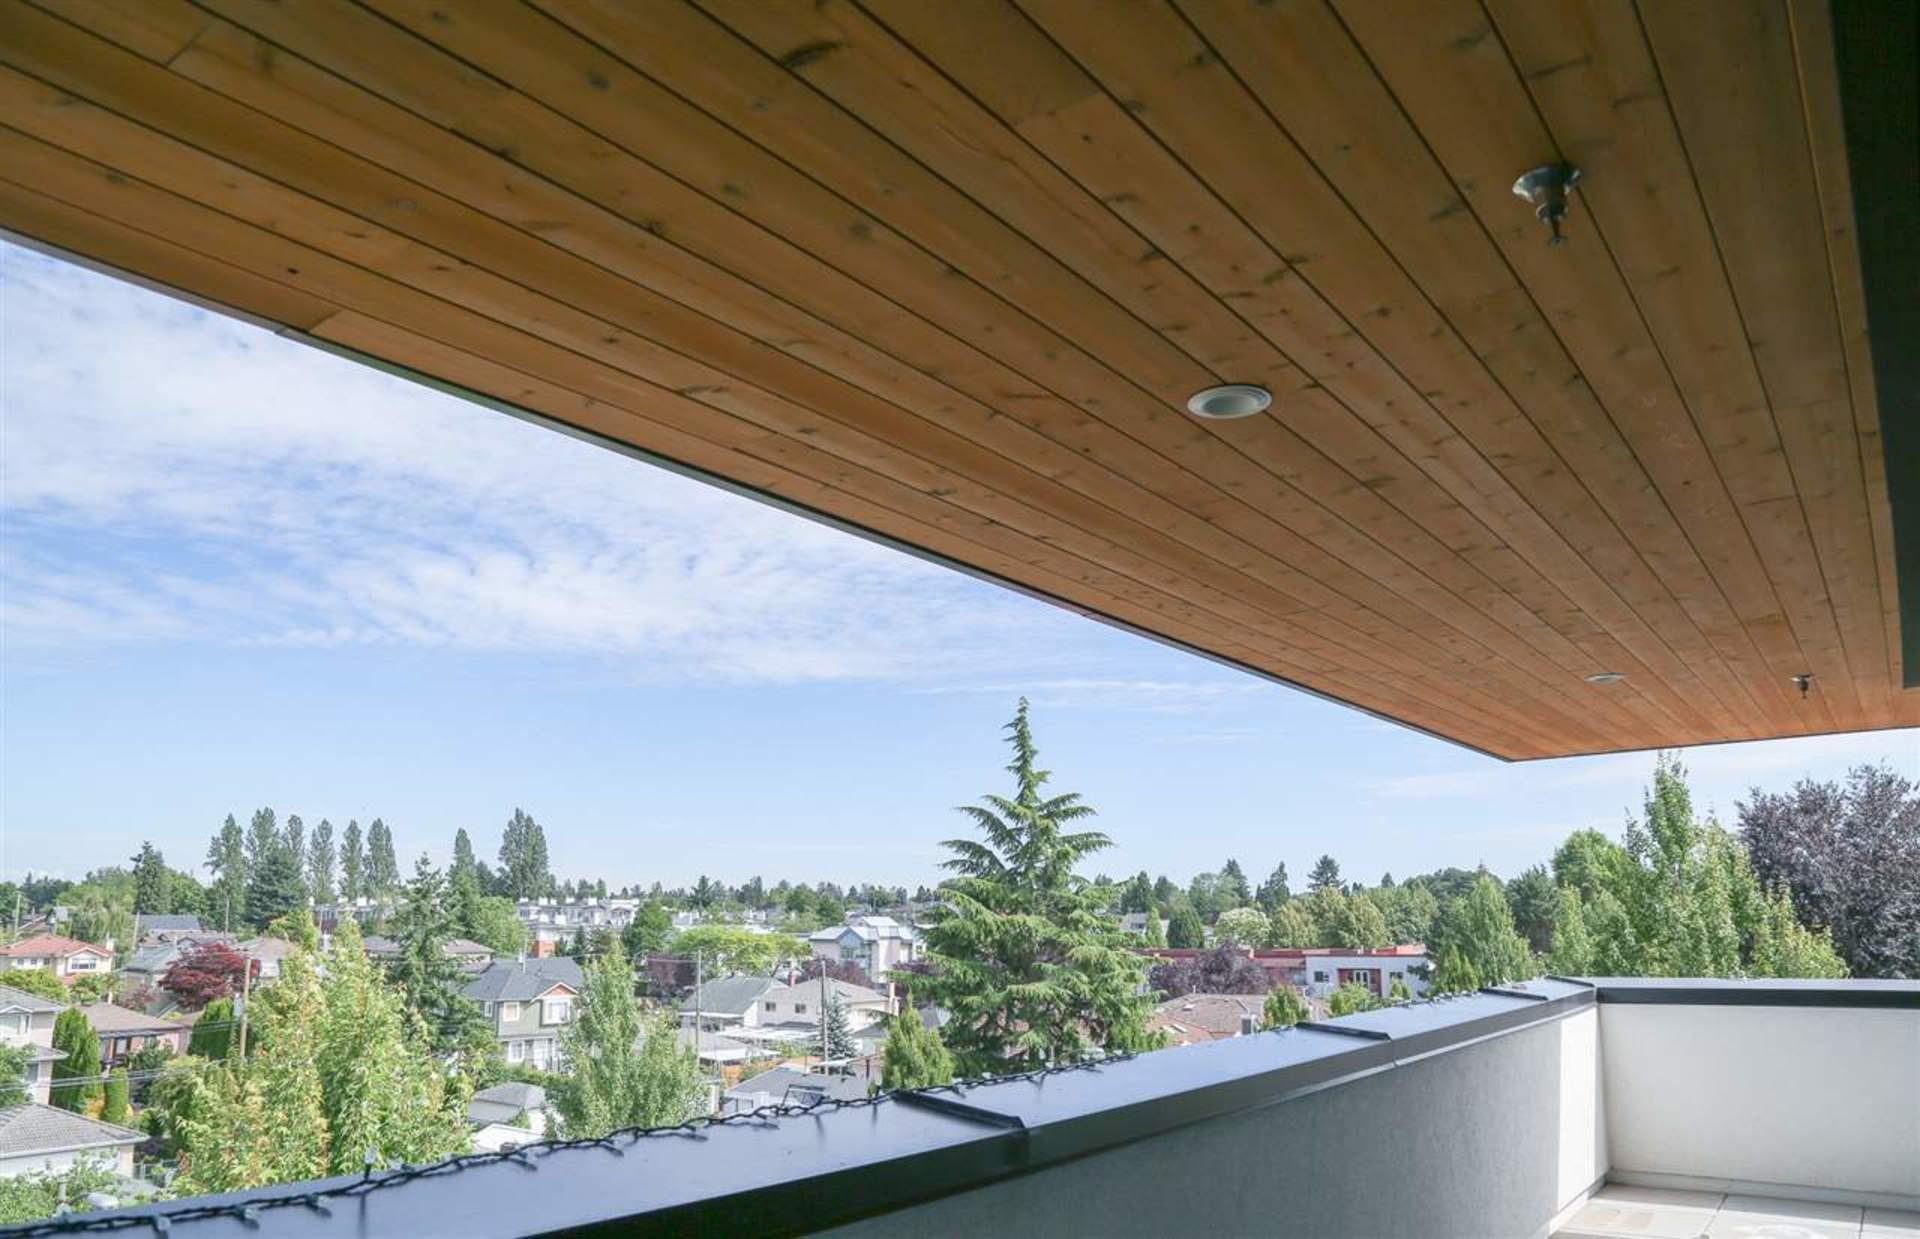 5085-main-street-main-vancouver-east-16 at 602 - 5085 Main Street, Main, Vancouver East